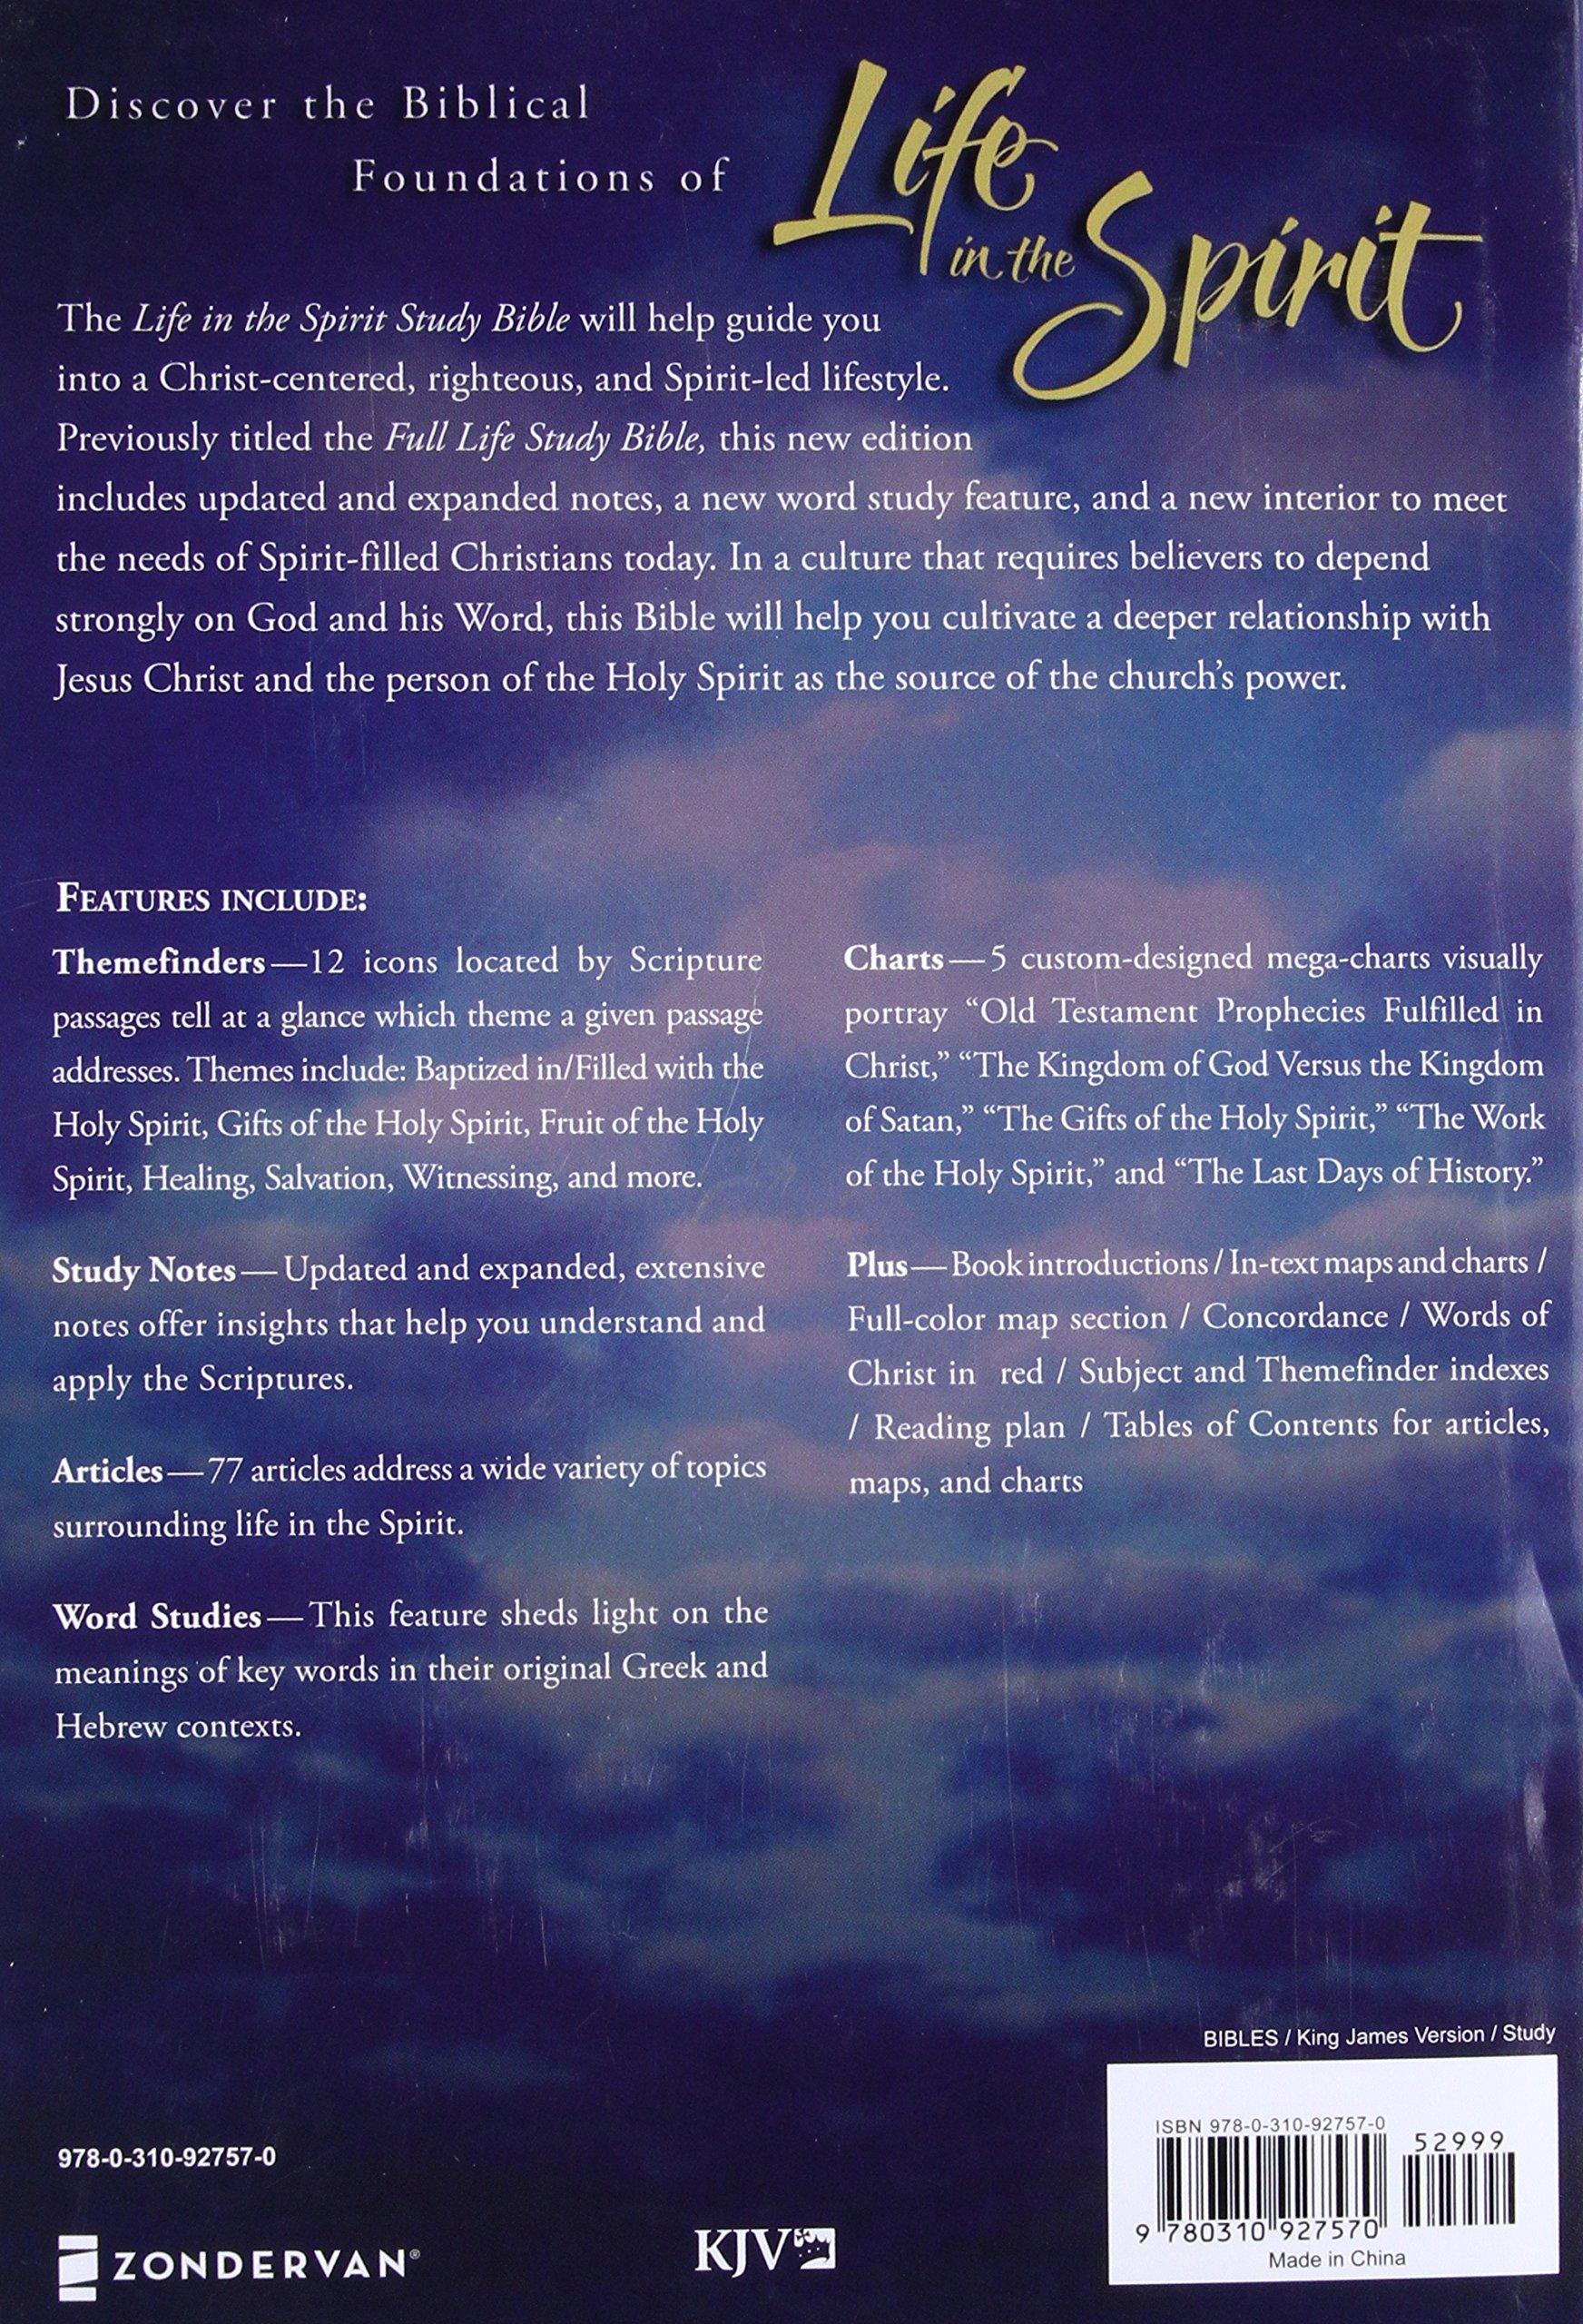 KJV, Life in the Spirit Study Bible, Hardcover, Red Letter Edition: Formerly Full Life Study: Zondervan: 9780310927570: Amazon.com: Books